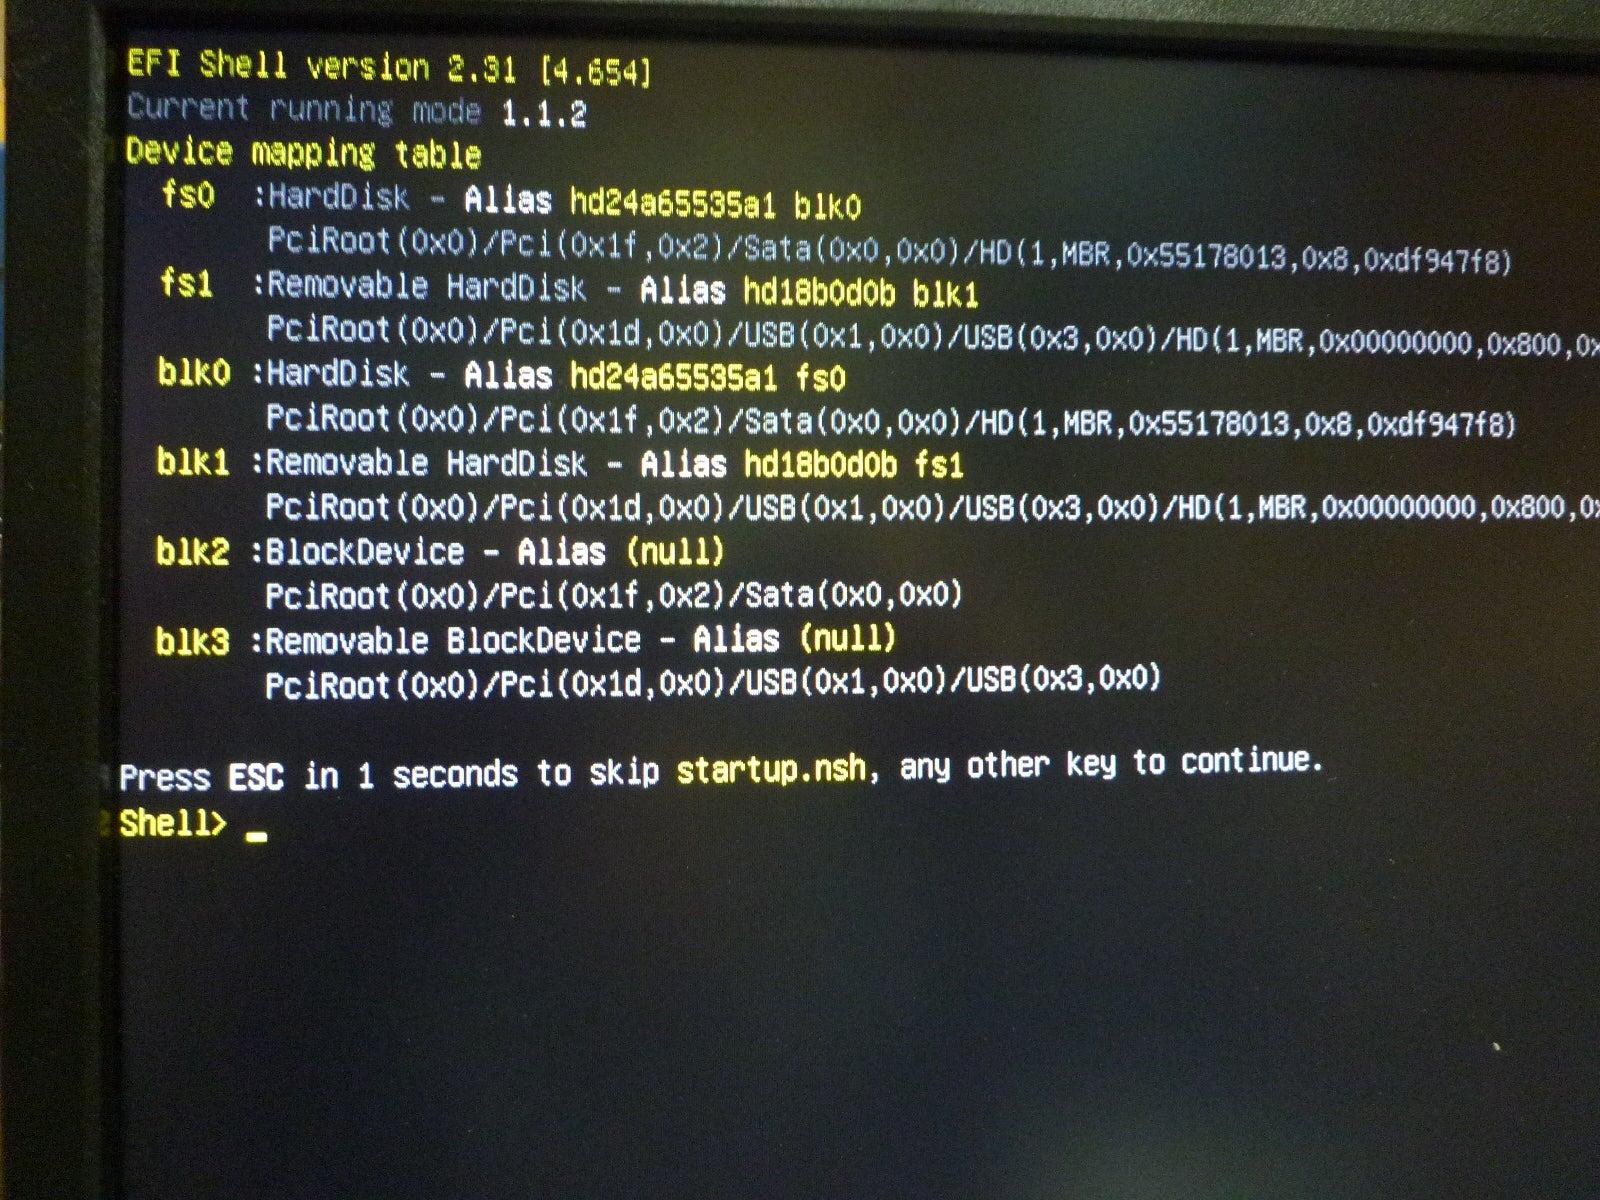 MSI Z87-G41 PC MATE BIOS CHIP